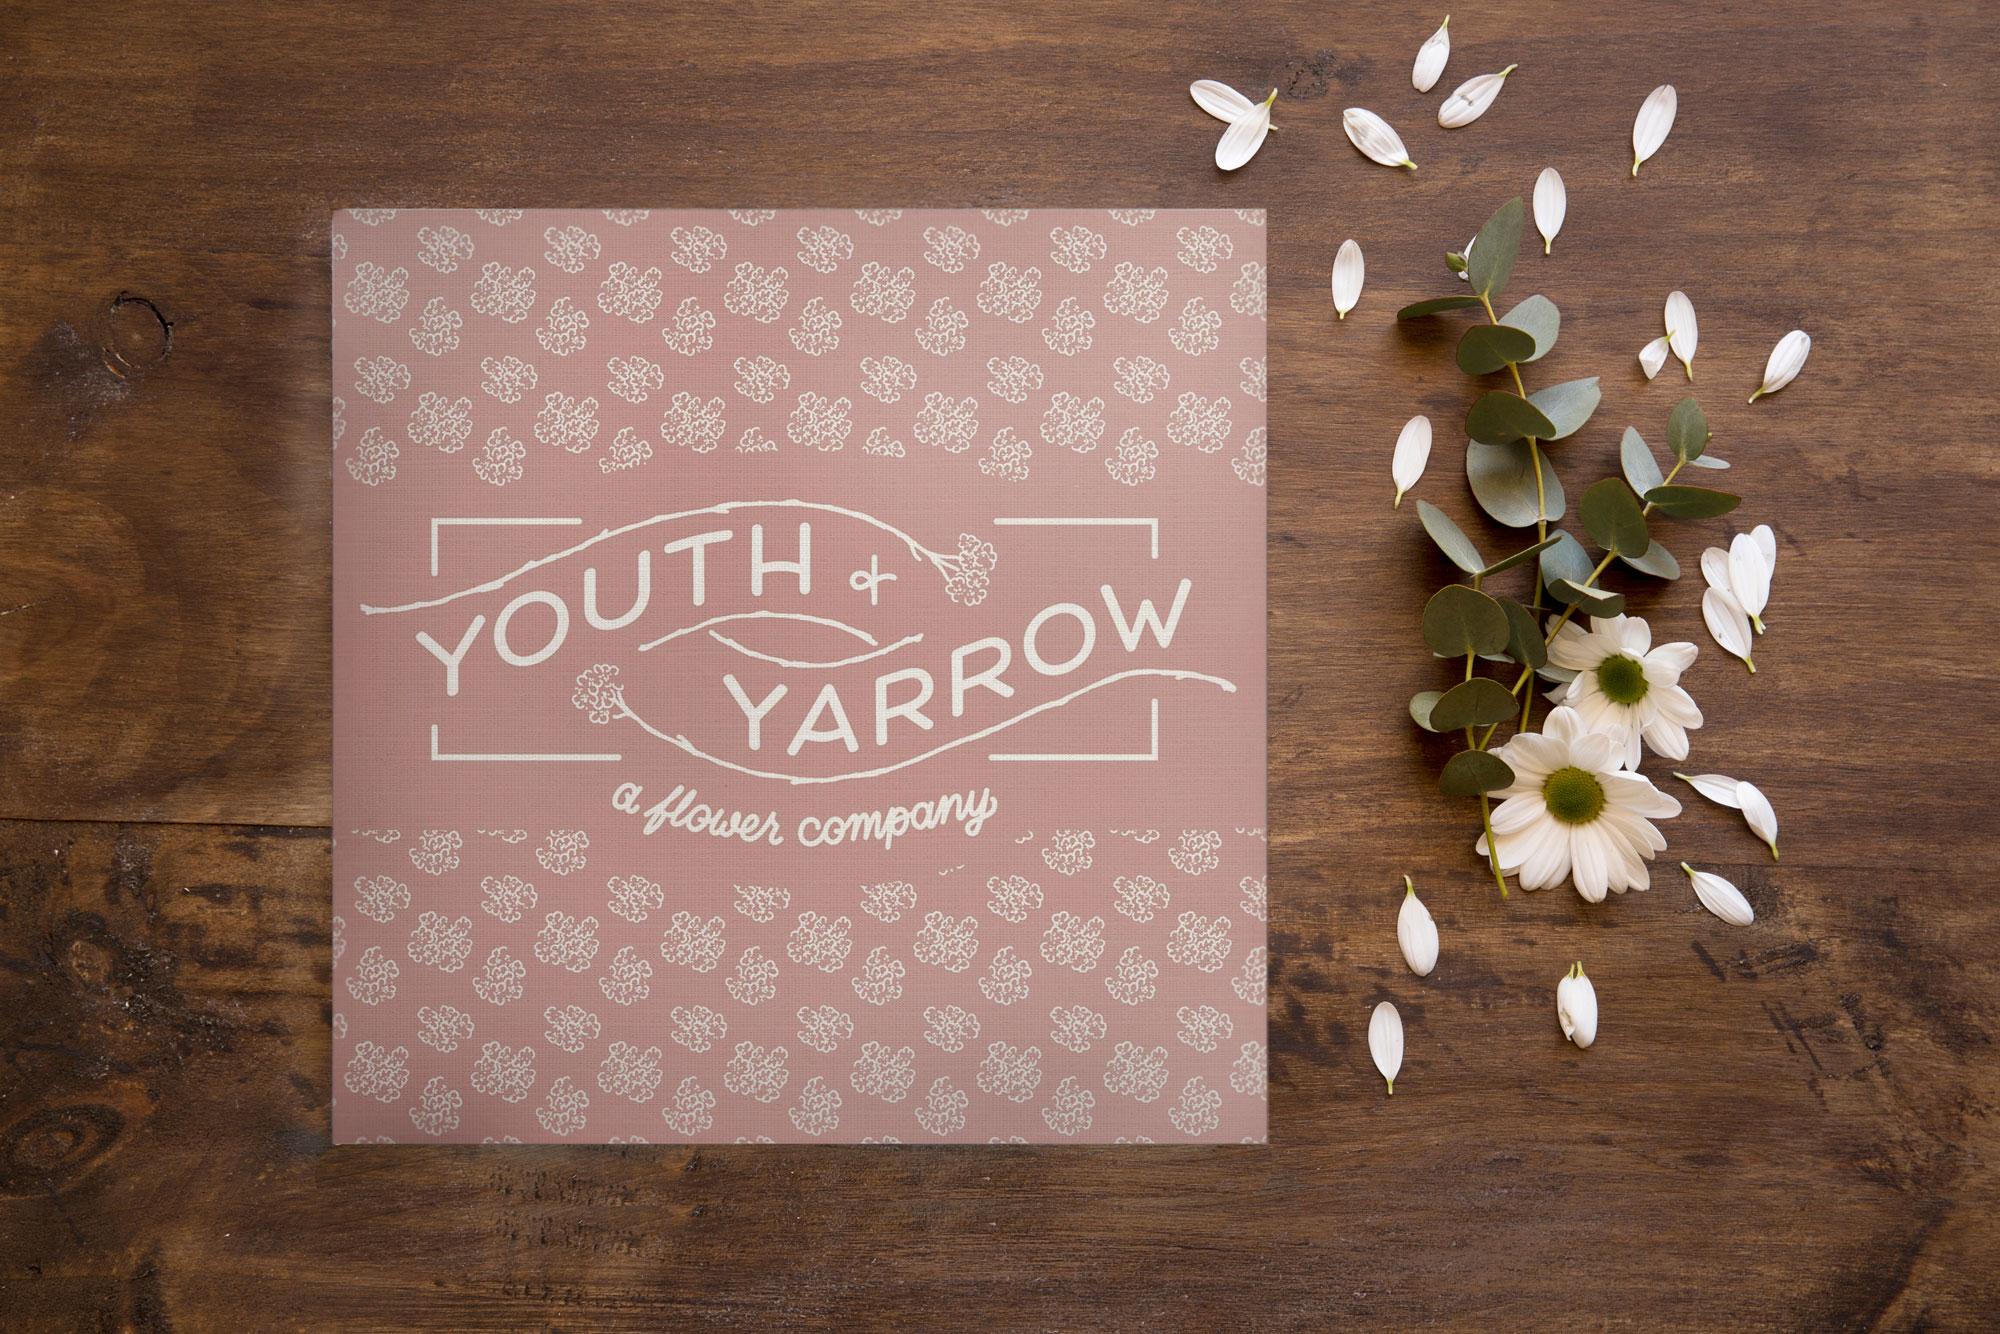 YouthYarrow_SquareCard_Mockup.jpg